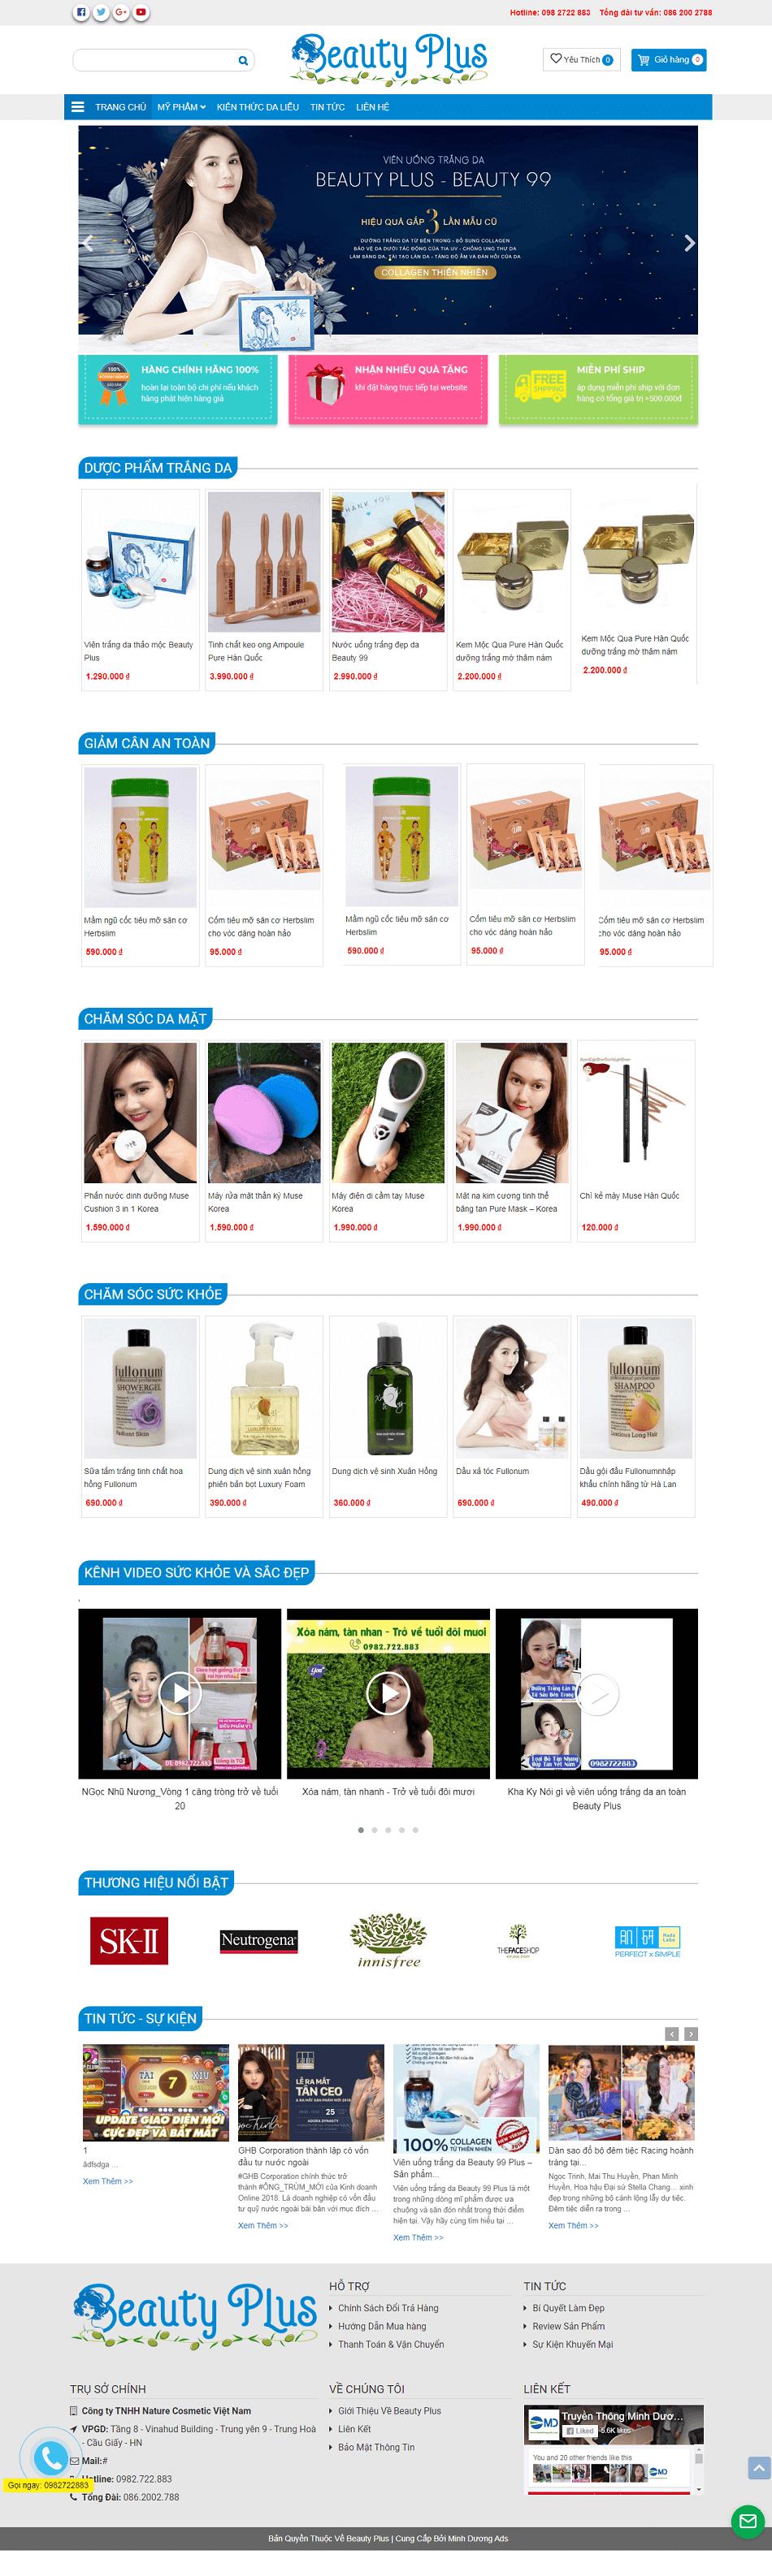 Web mỹ phẩm Beauty